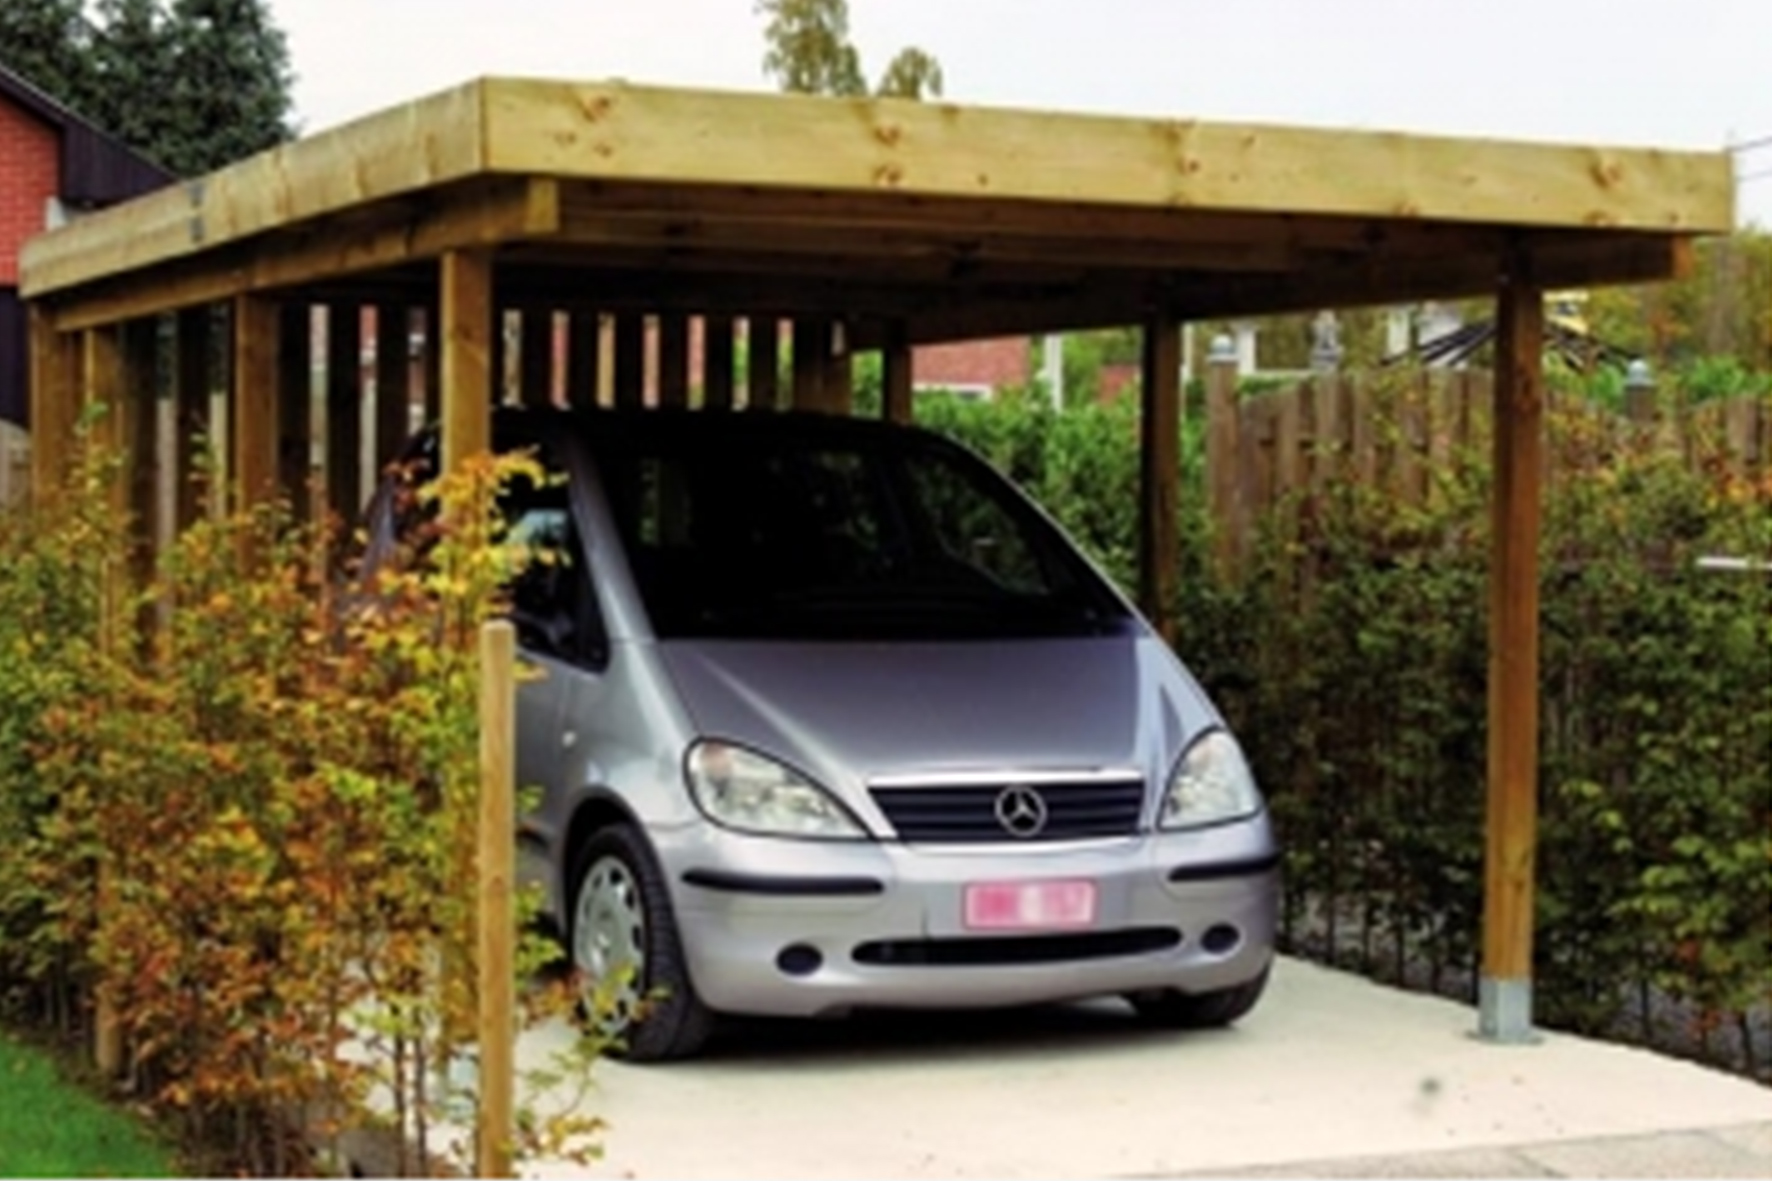 leboutte.be/images/catalogue/jardin/carport-763108.jpg